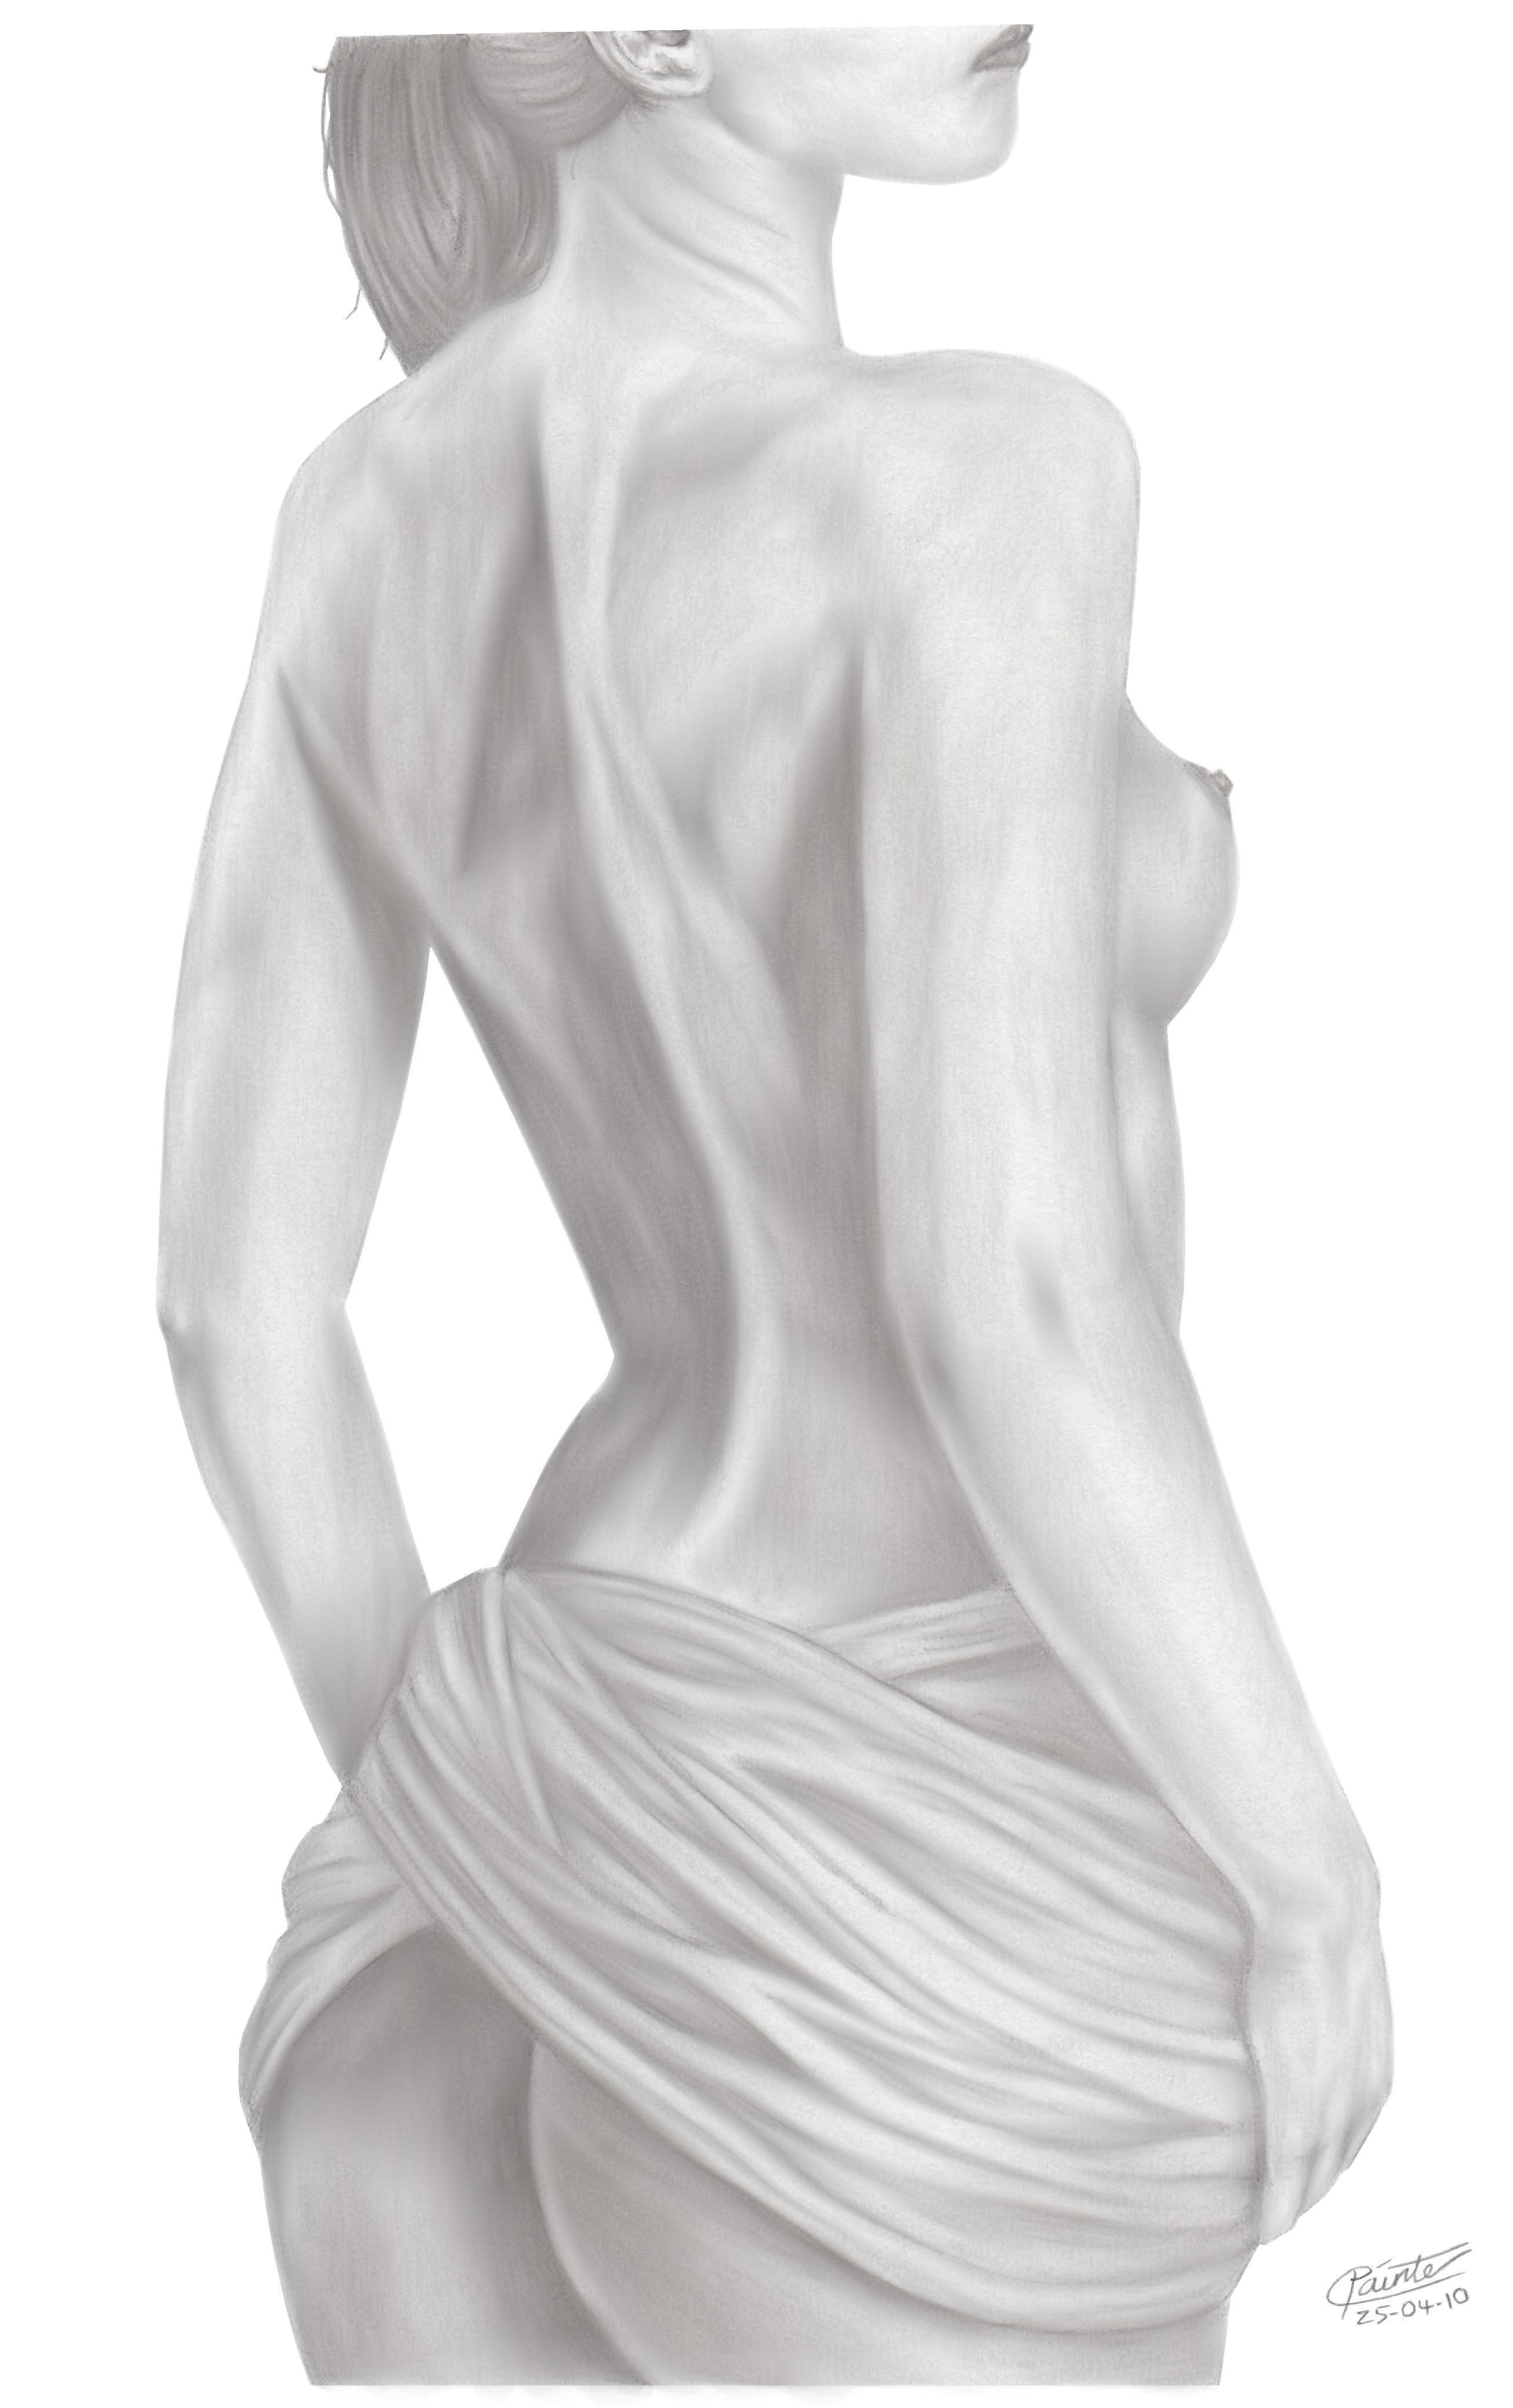 Nude ladies kissing a man